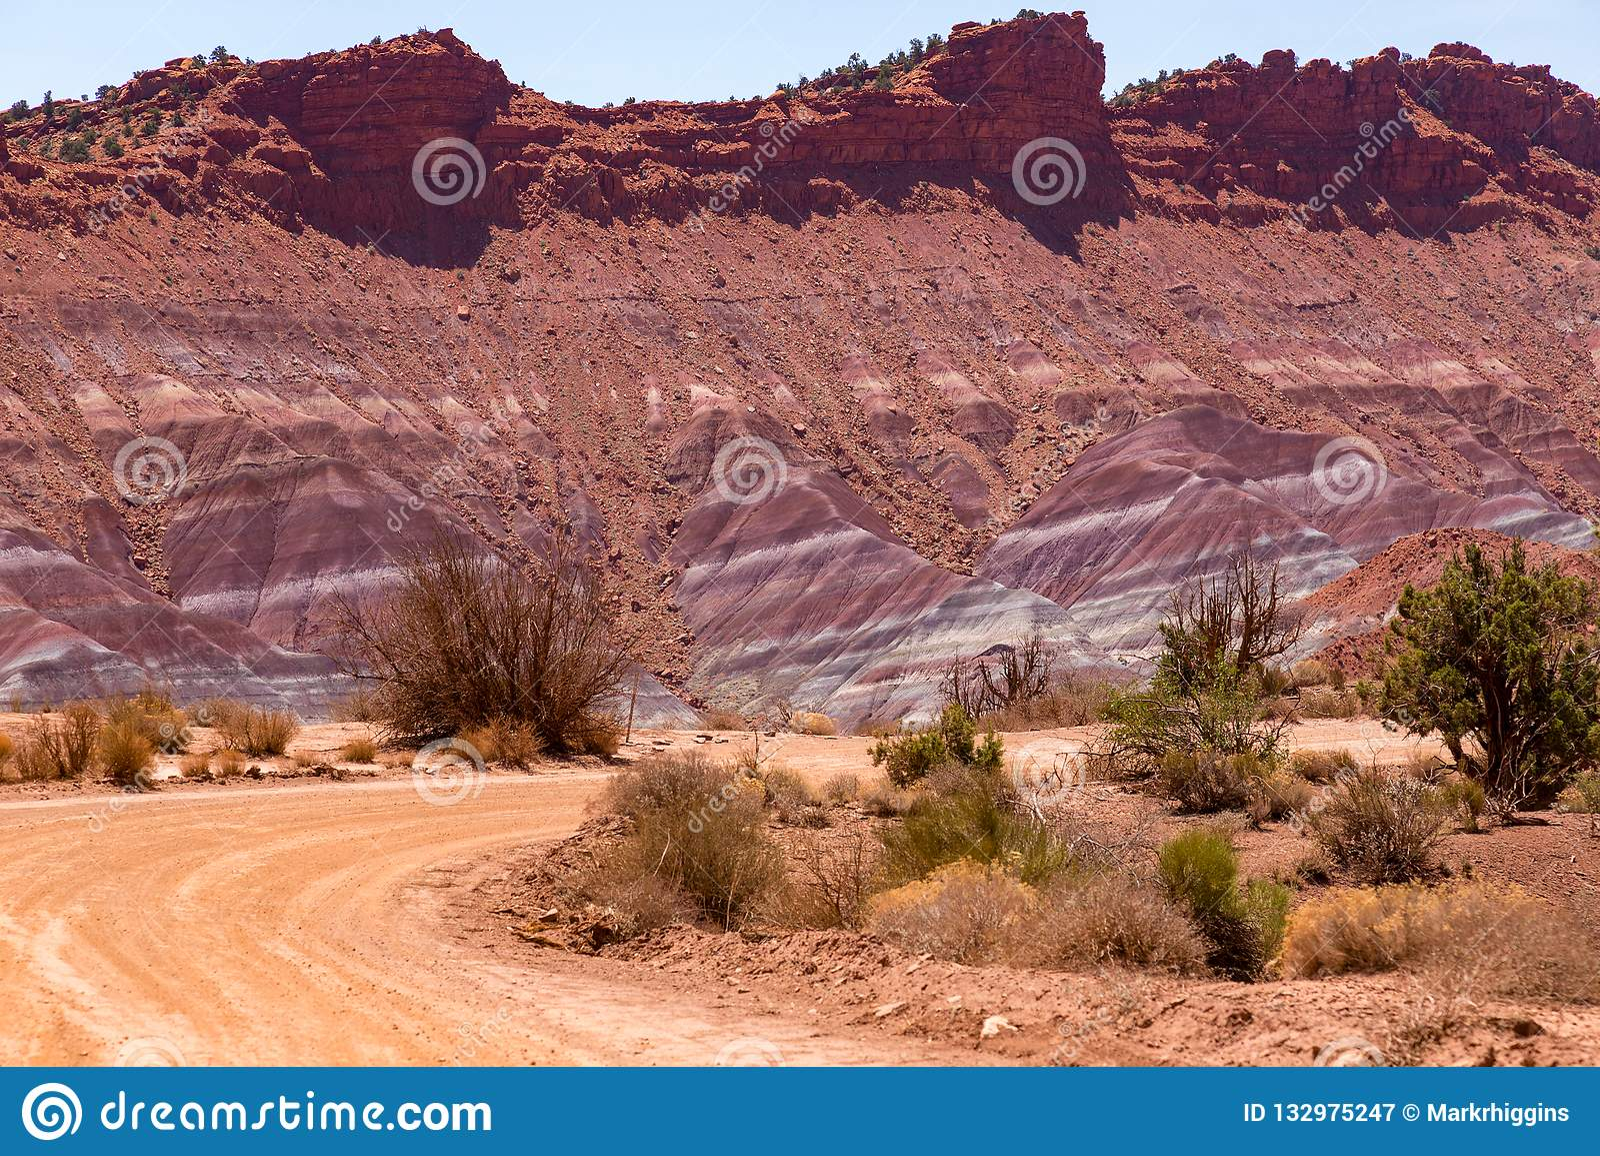 Coyote Buttes In The Vermilion Cliffs Arizona Stock Photo